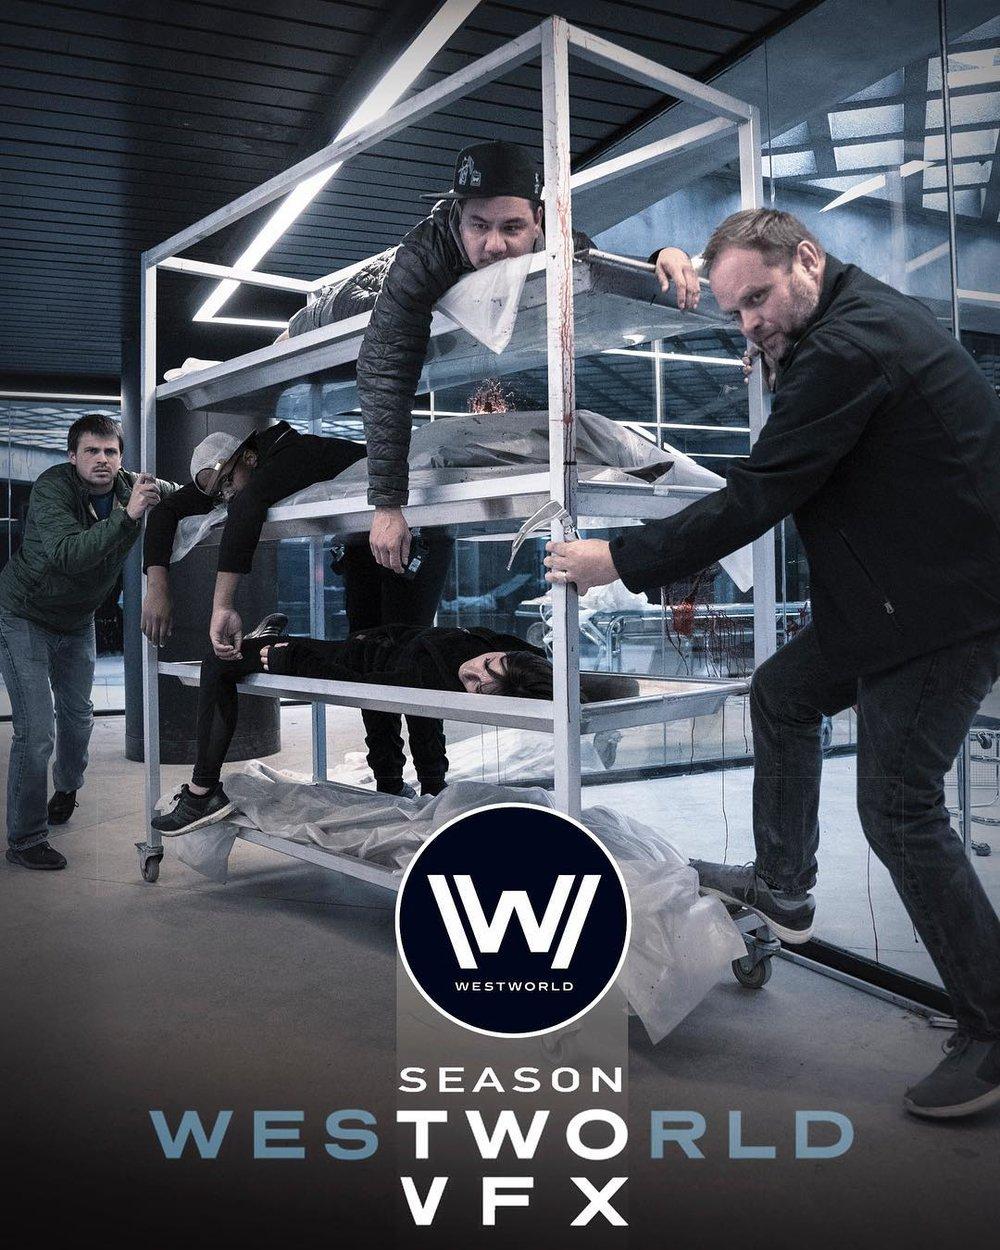 Westworld Season 2 on-set VFX crew photo